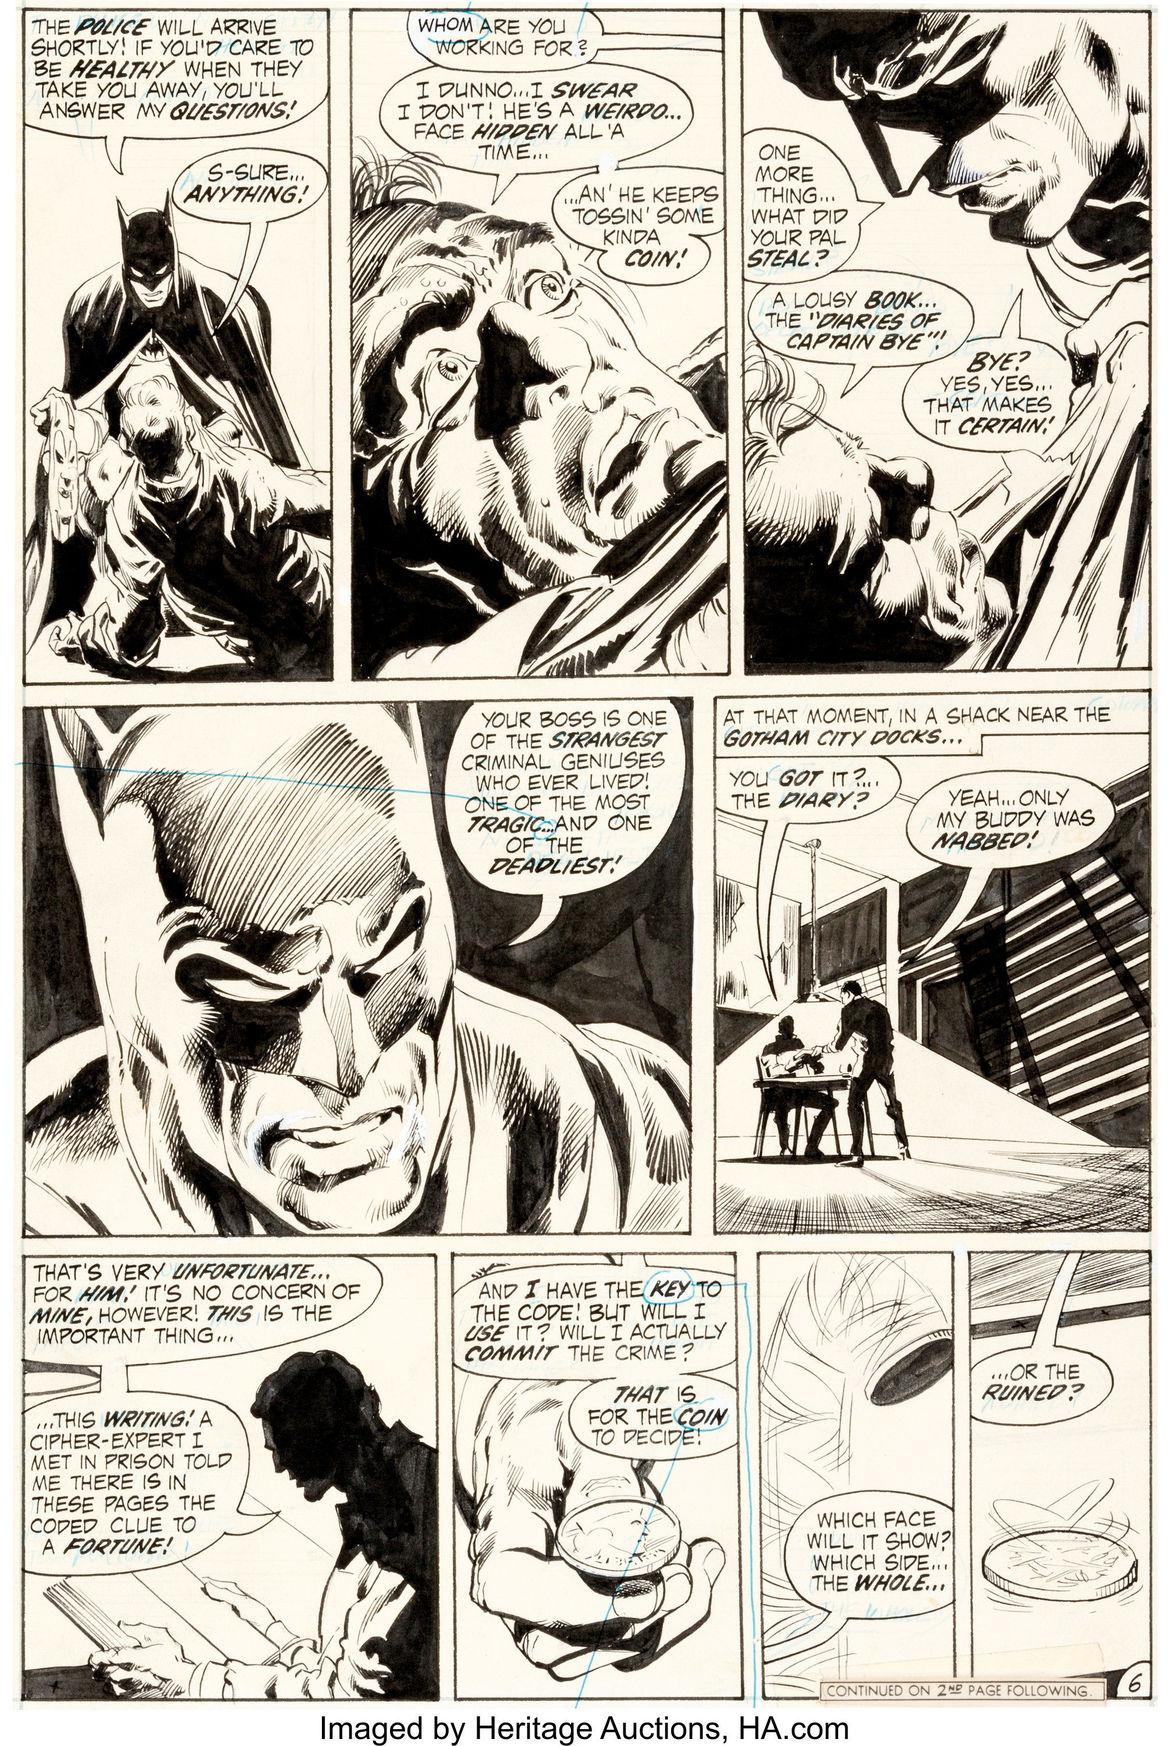 Neal Adams and Dick Giordano Batman #234 Page 6 Original Art (DC, 1971)